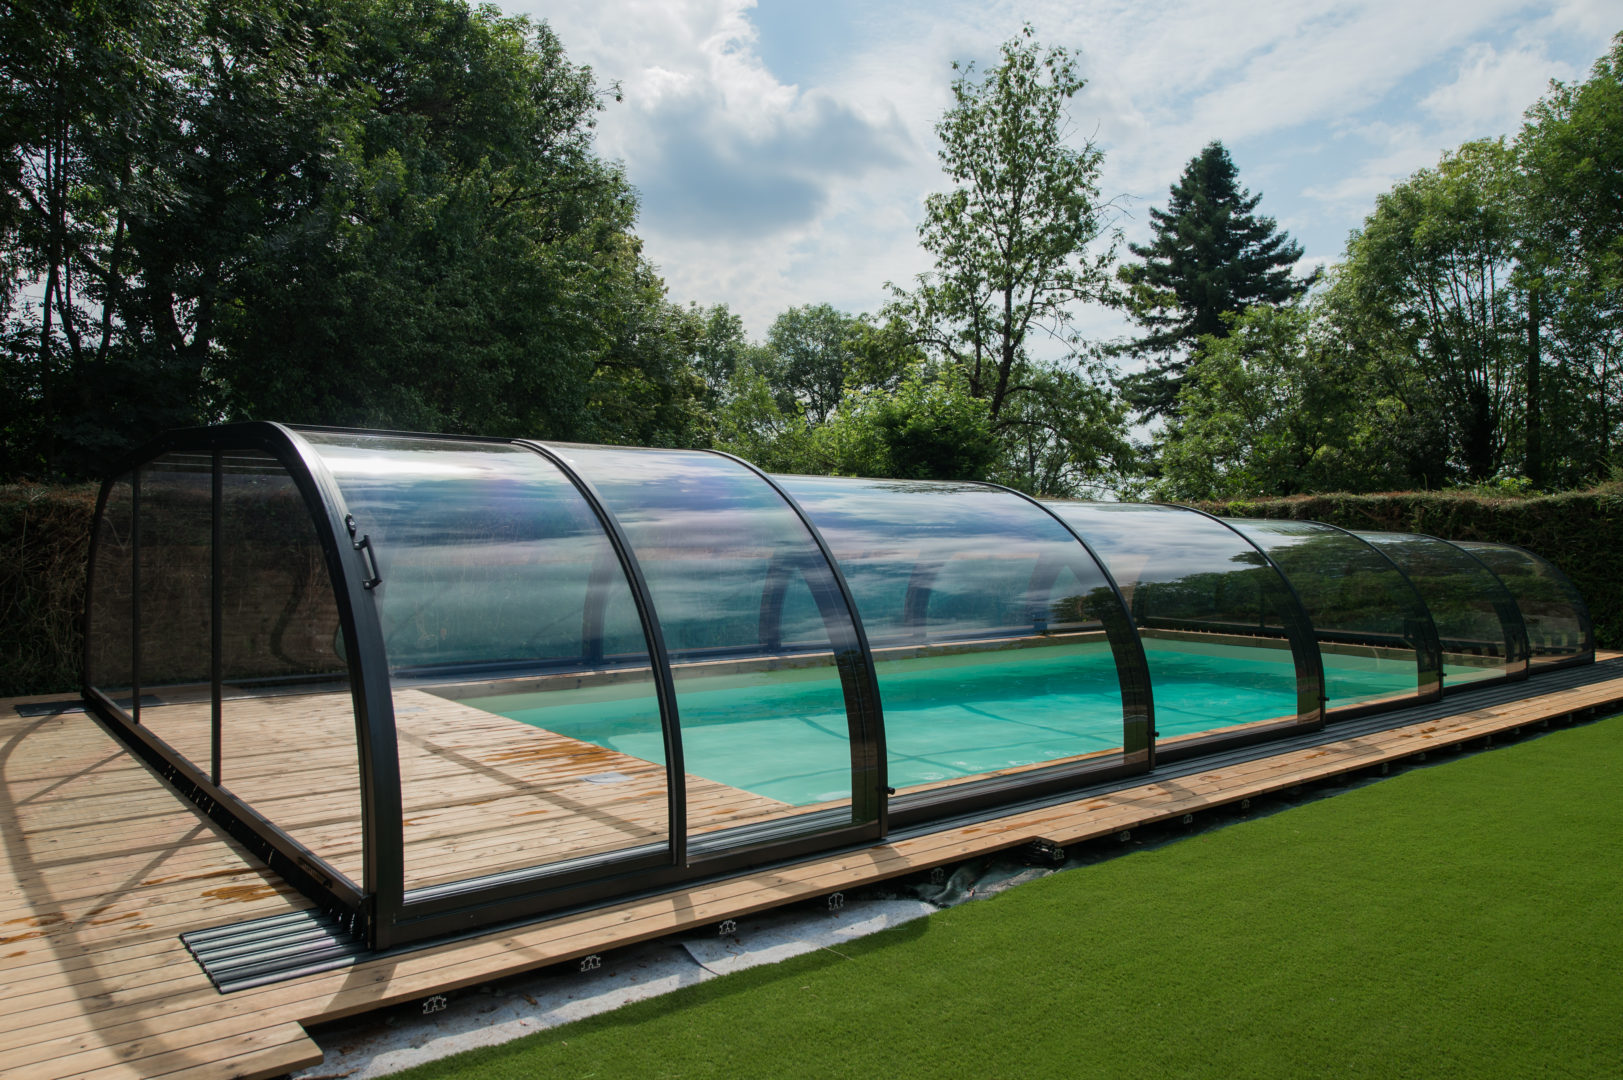 piscine ; gîte de groupe ; ferme pédagogique tarn